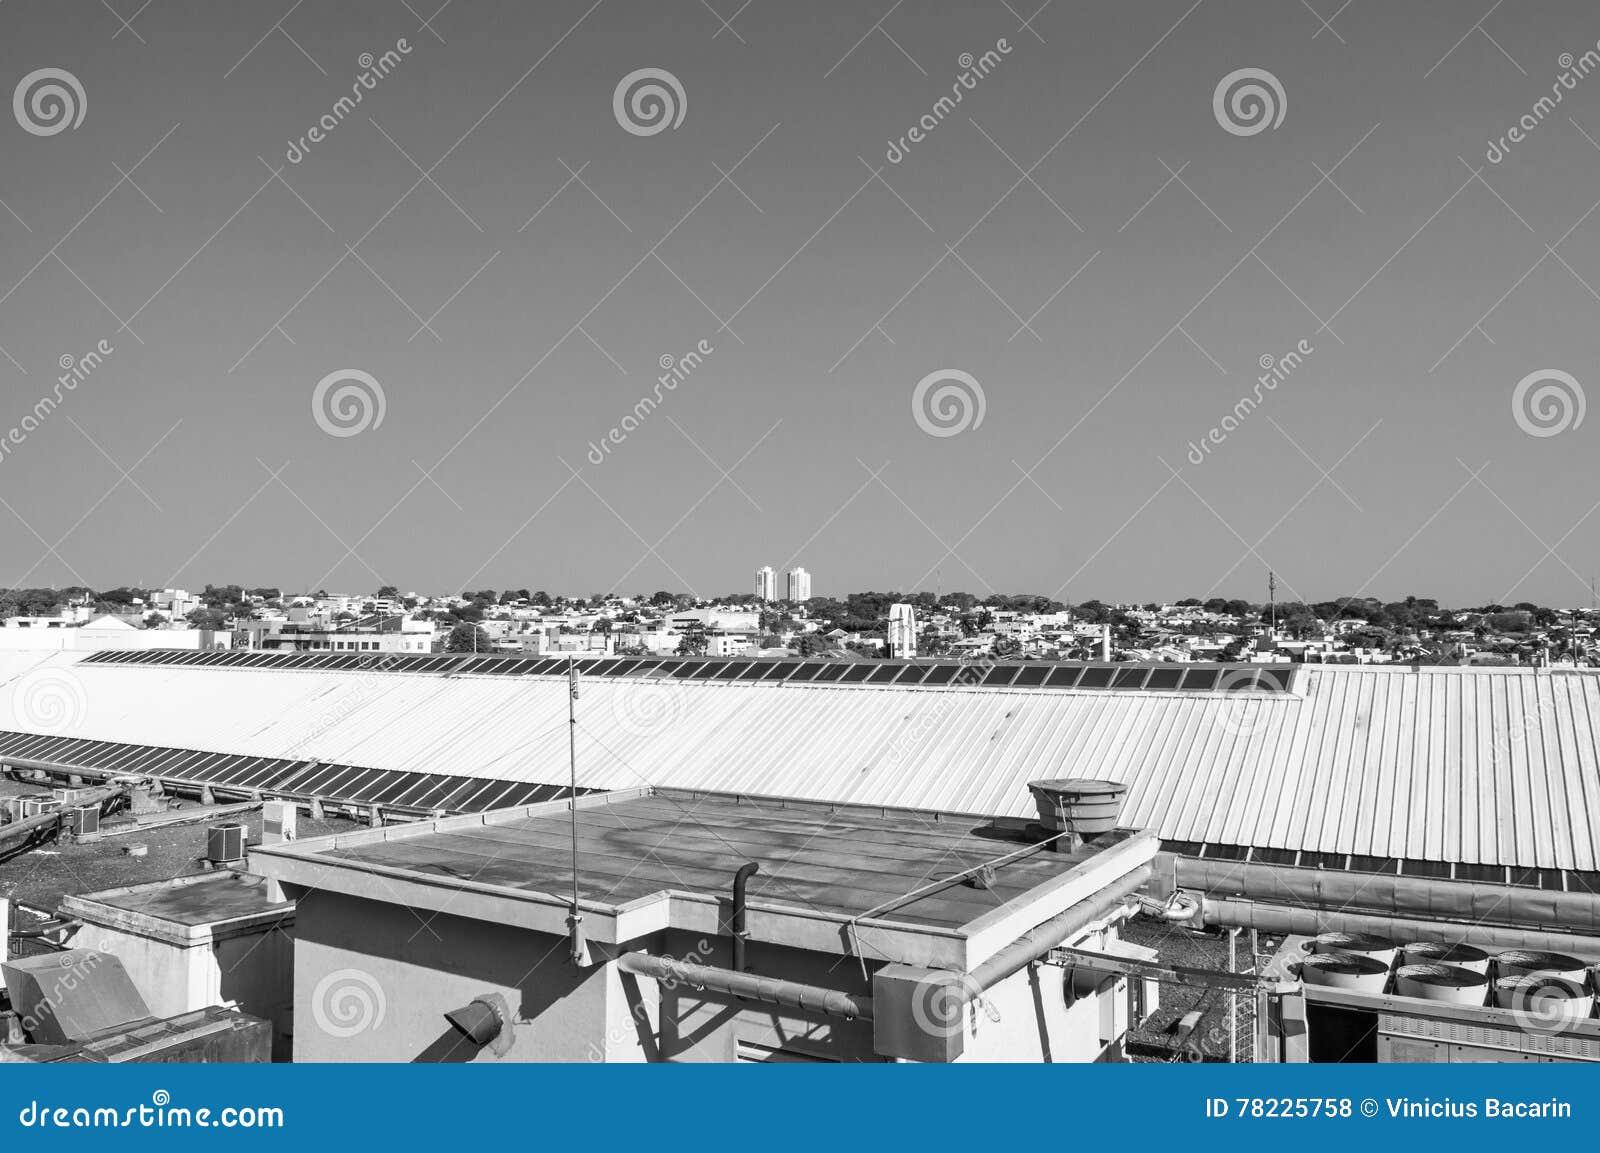 Telhe a vista onde pode observar a cidade de Campo grandioso